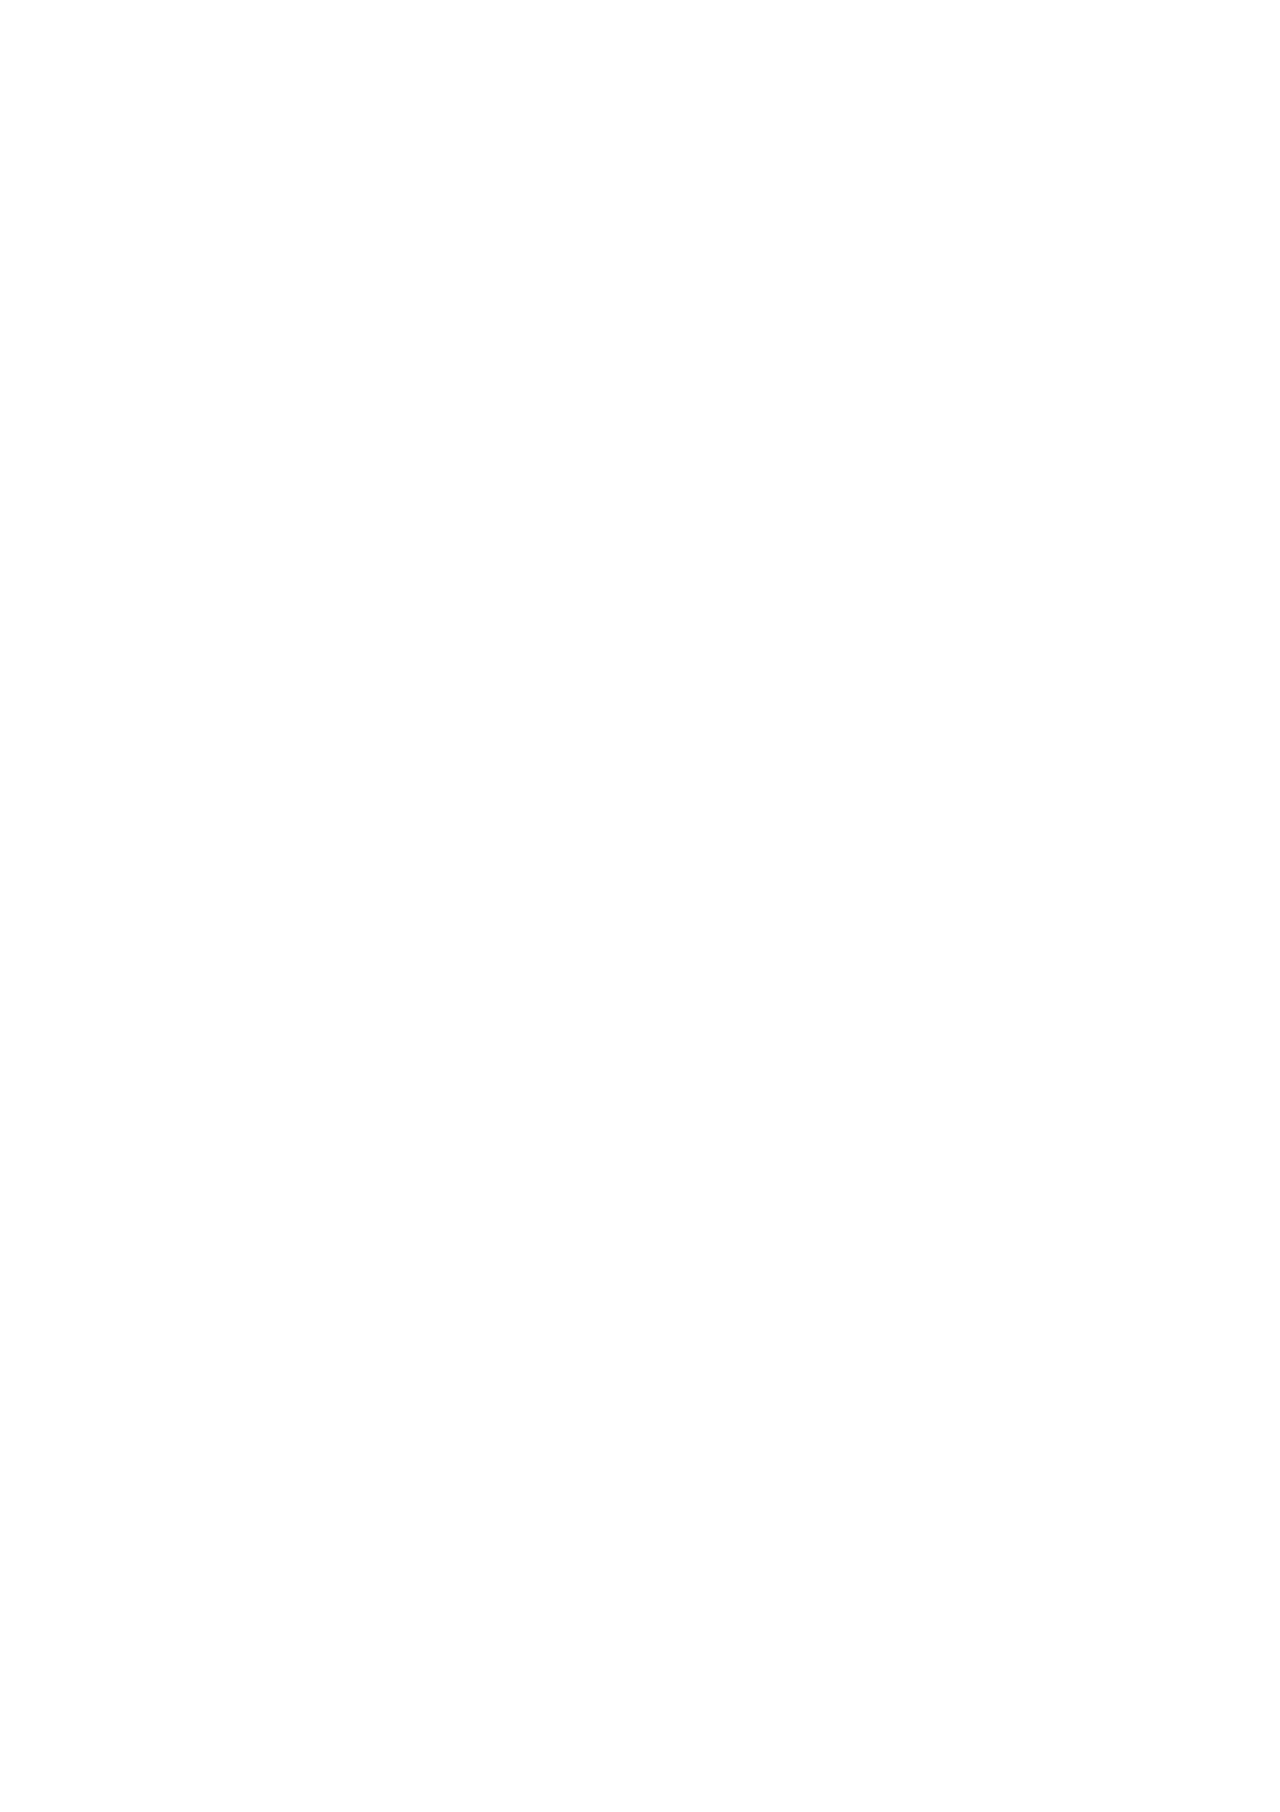 [Otabe Dynamites (Otabe Sakura)] 148cm No Bra & Kyonyuu Therapist to Micchaku H | Close Contact with a 148cm, Big-Boobed & Bra-less Therapist [English] [Confidential TL] [Digital] 24